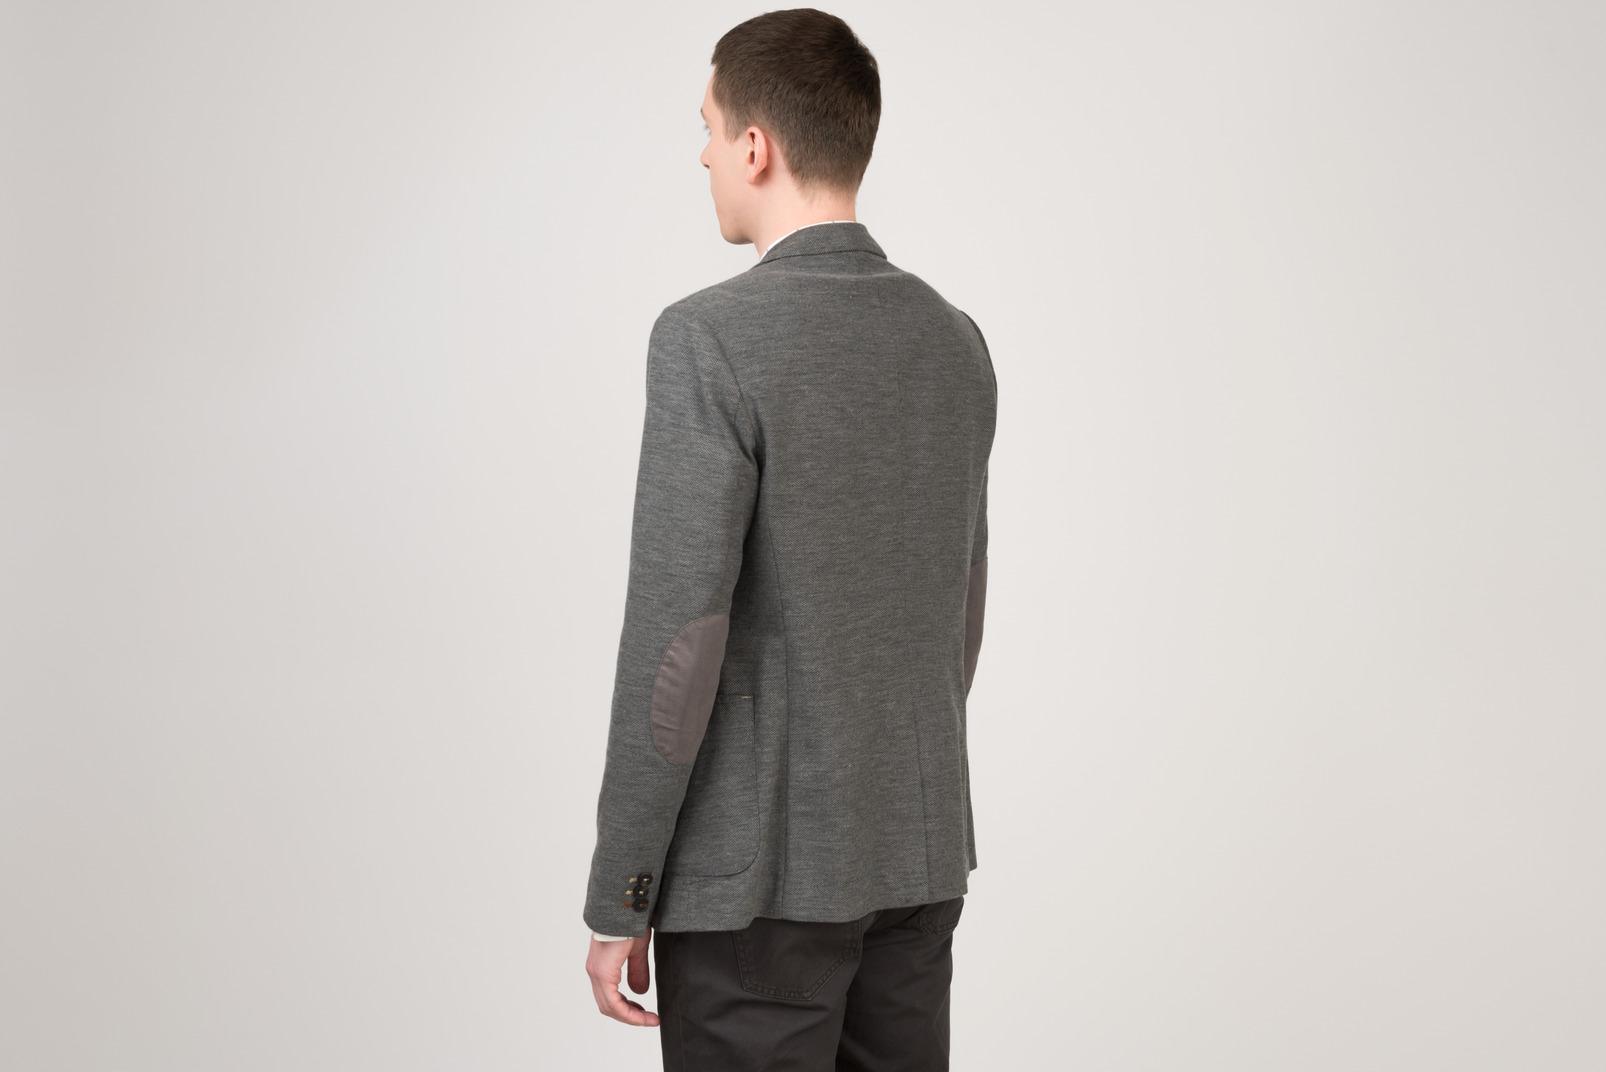 Young man standing half sideways